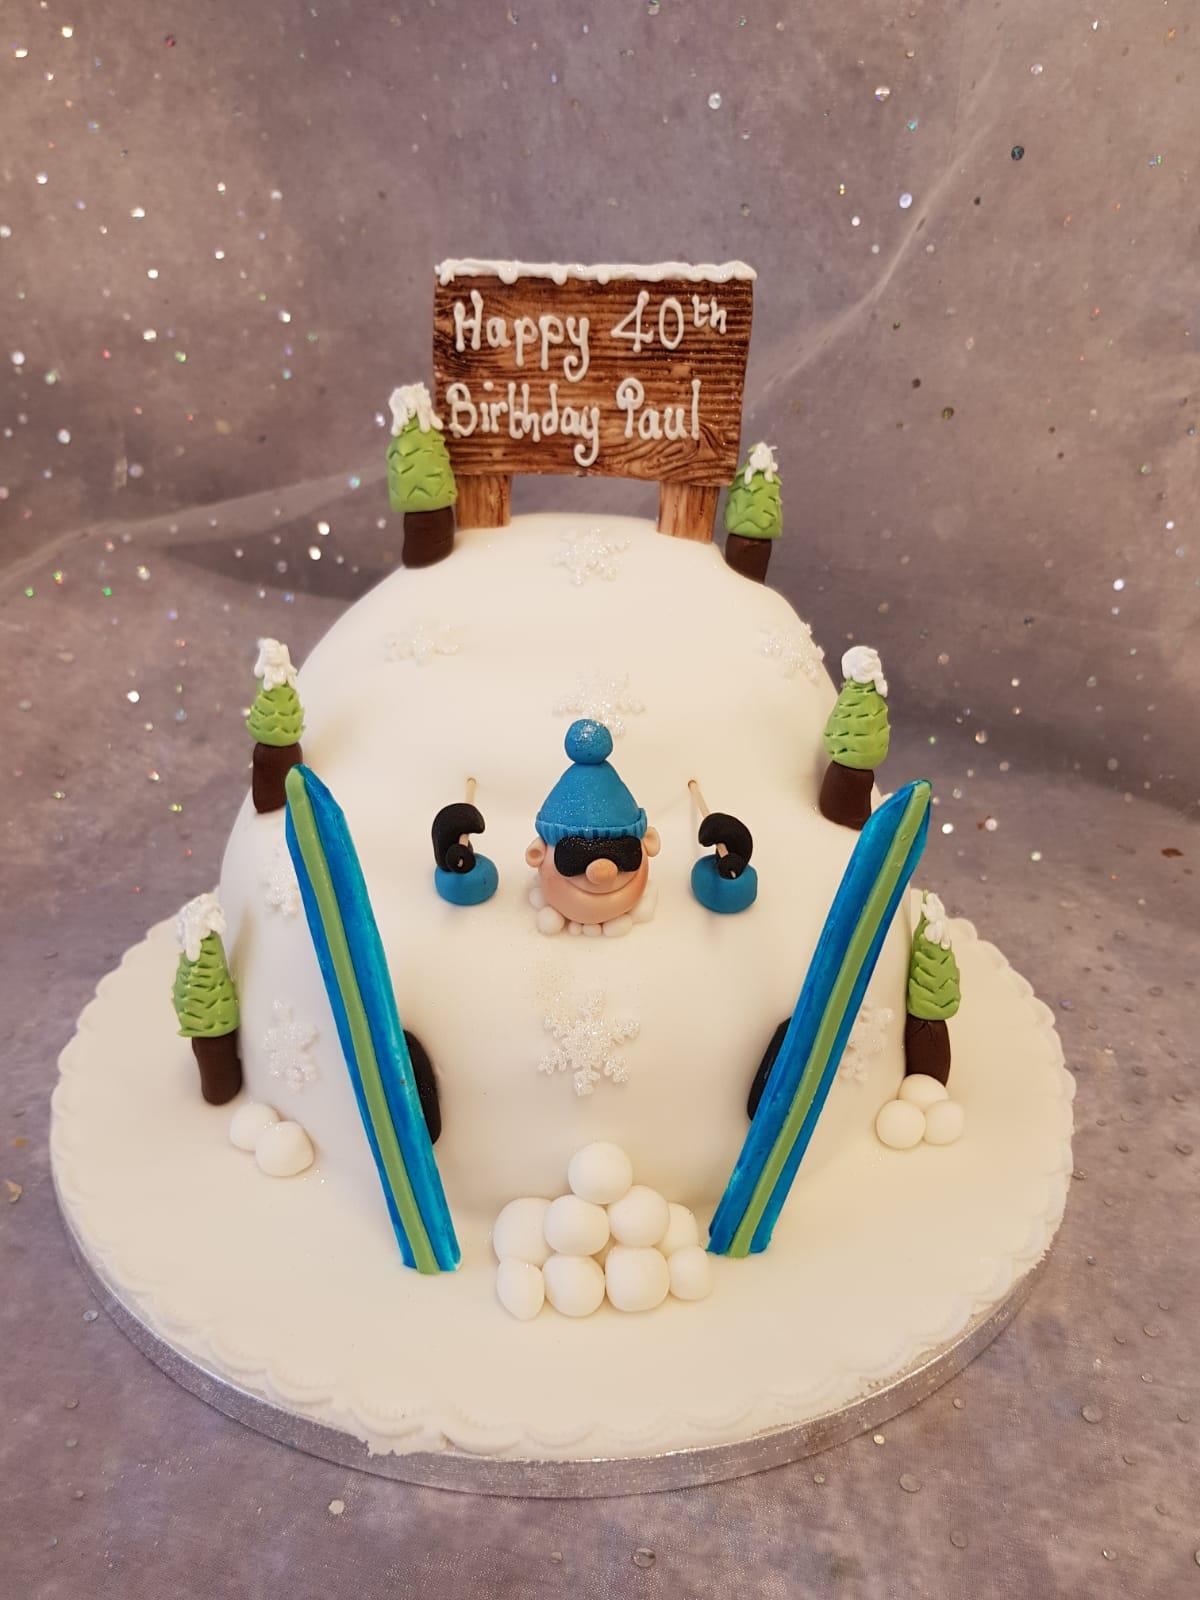 Ski Theme Cake Ravens Bakery Of Essex Ltd